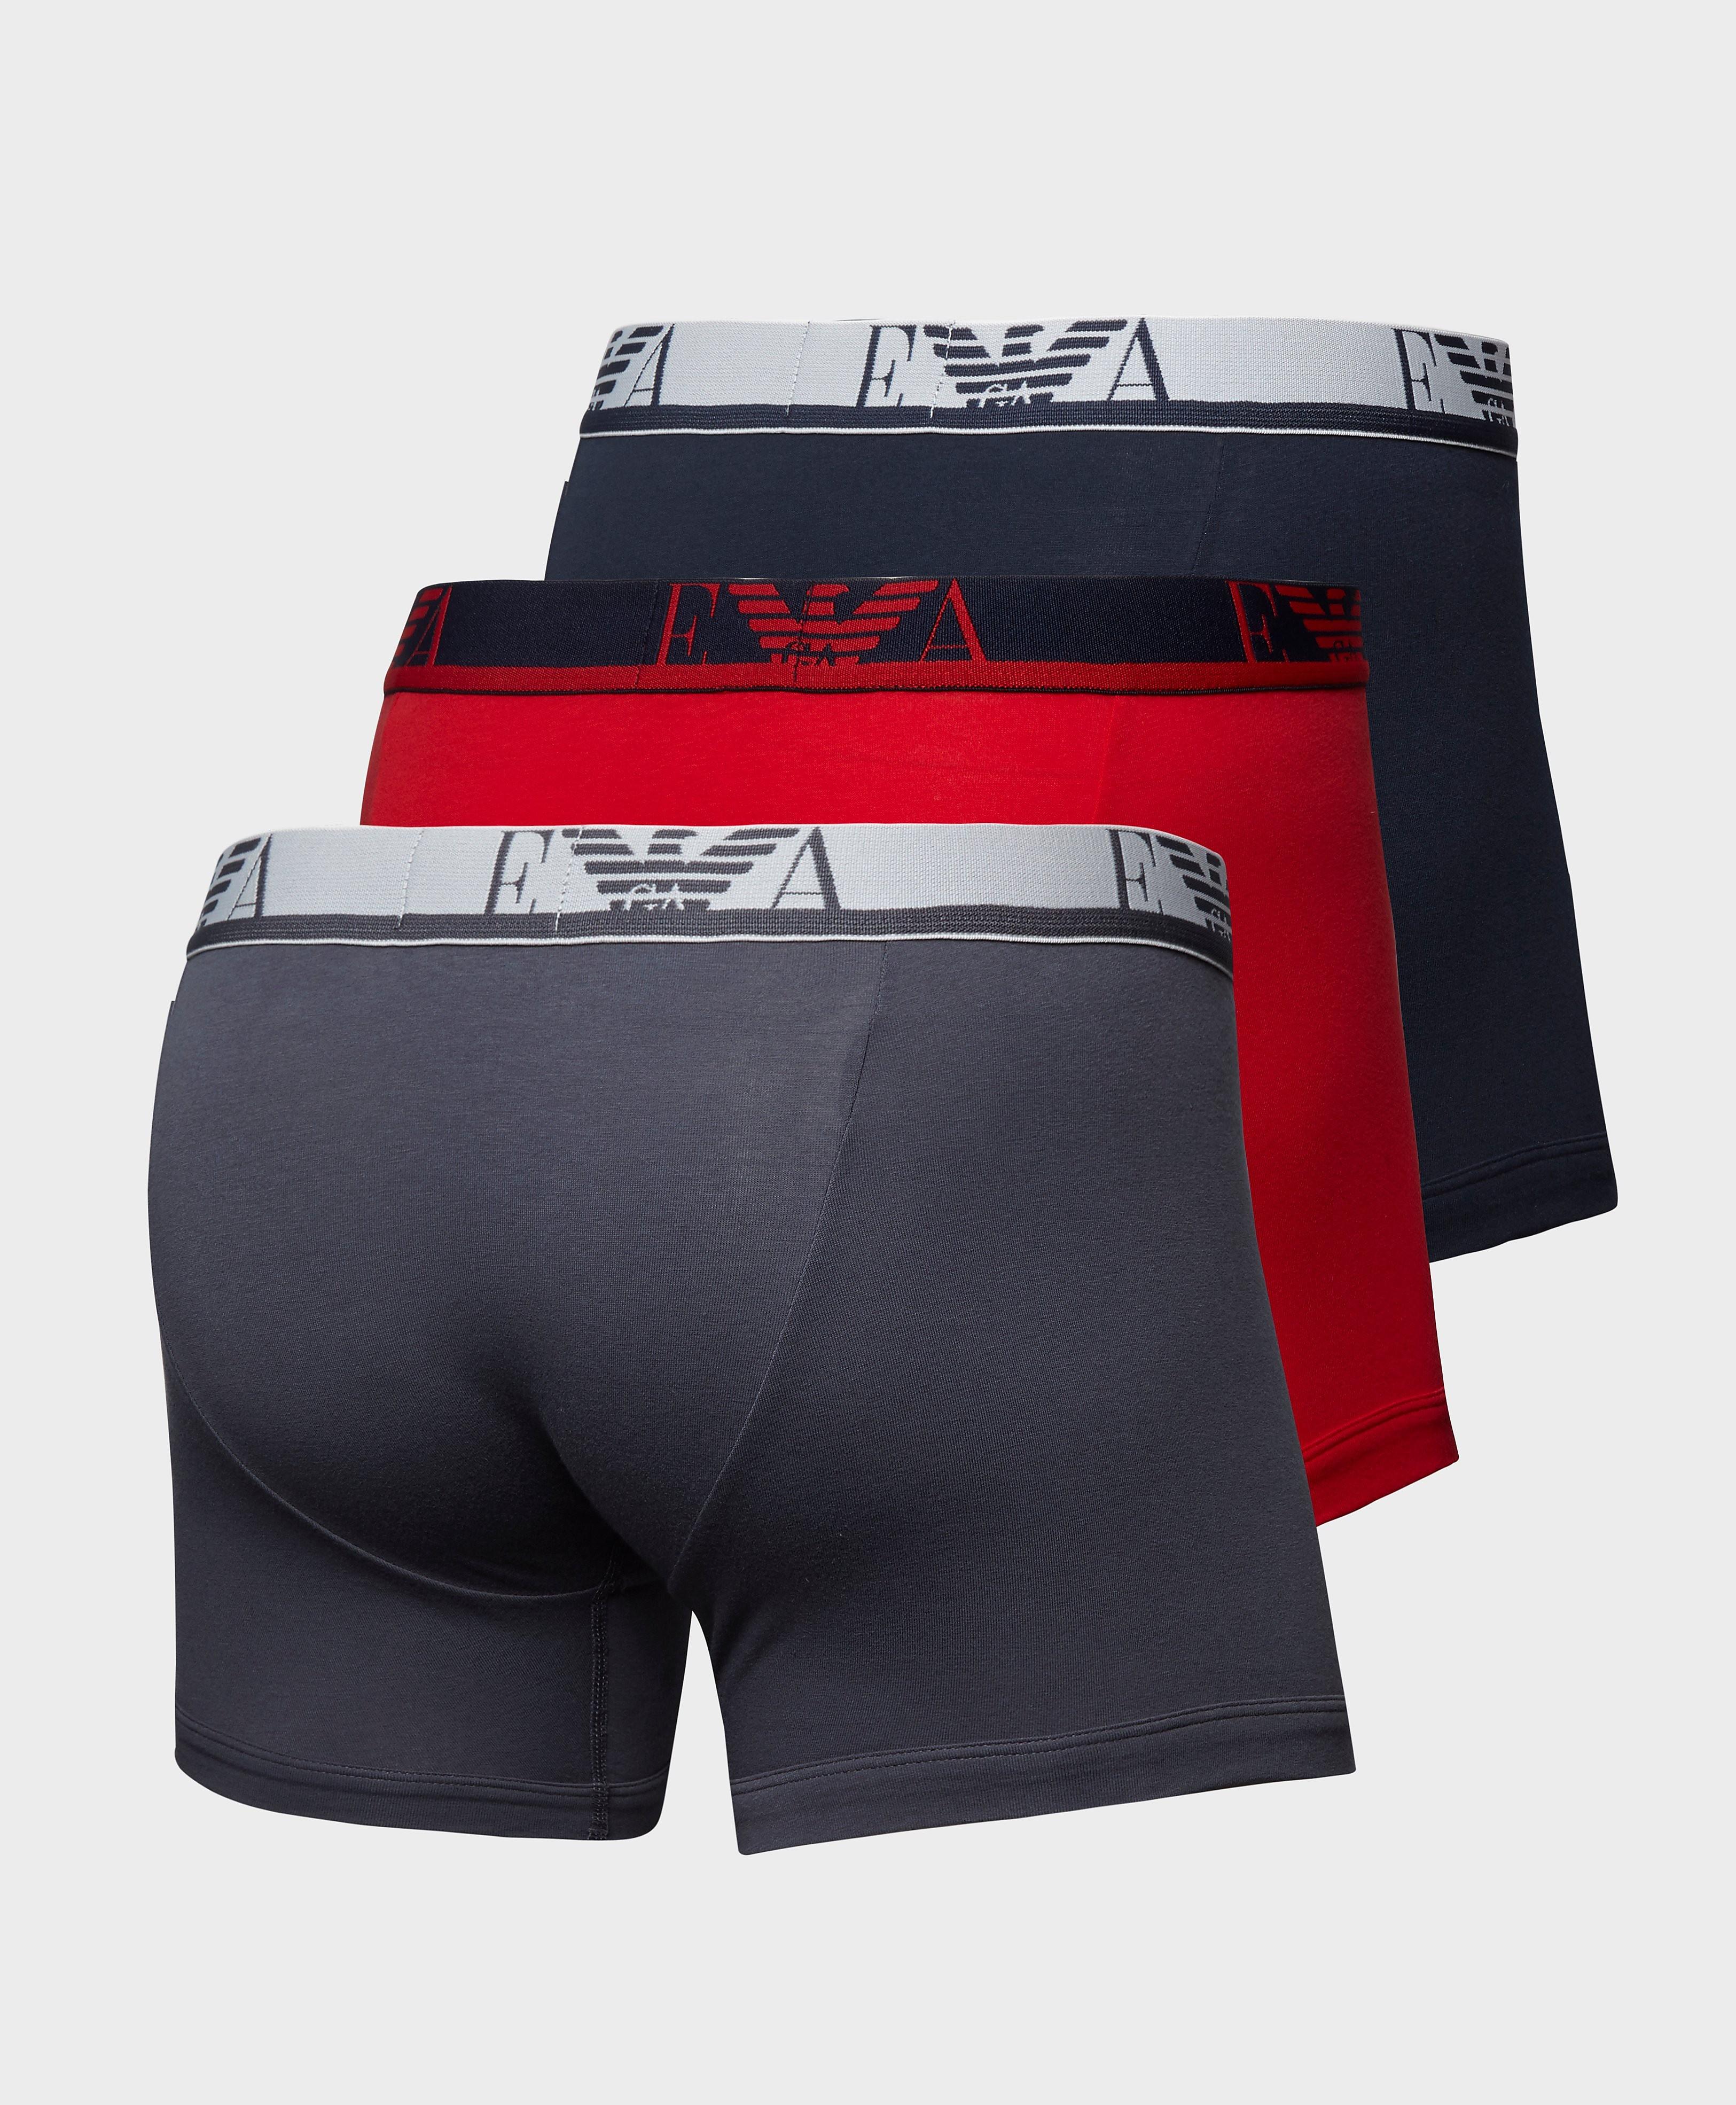 Emporio Armani 3 Pack Boxers